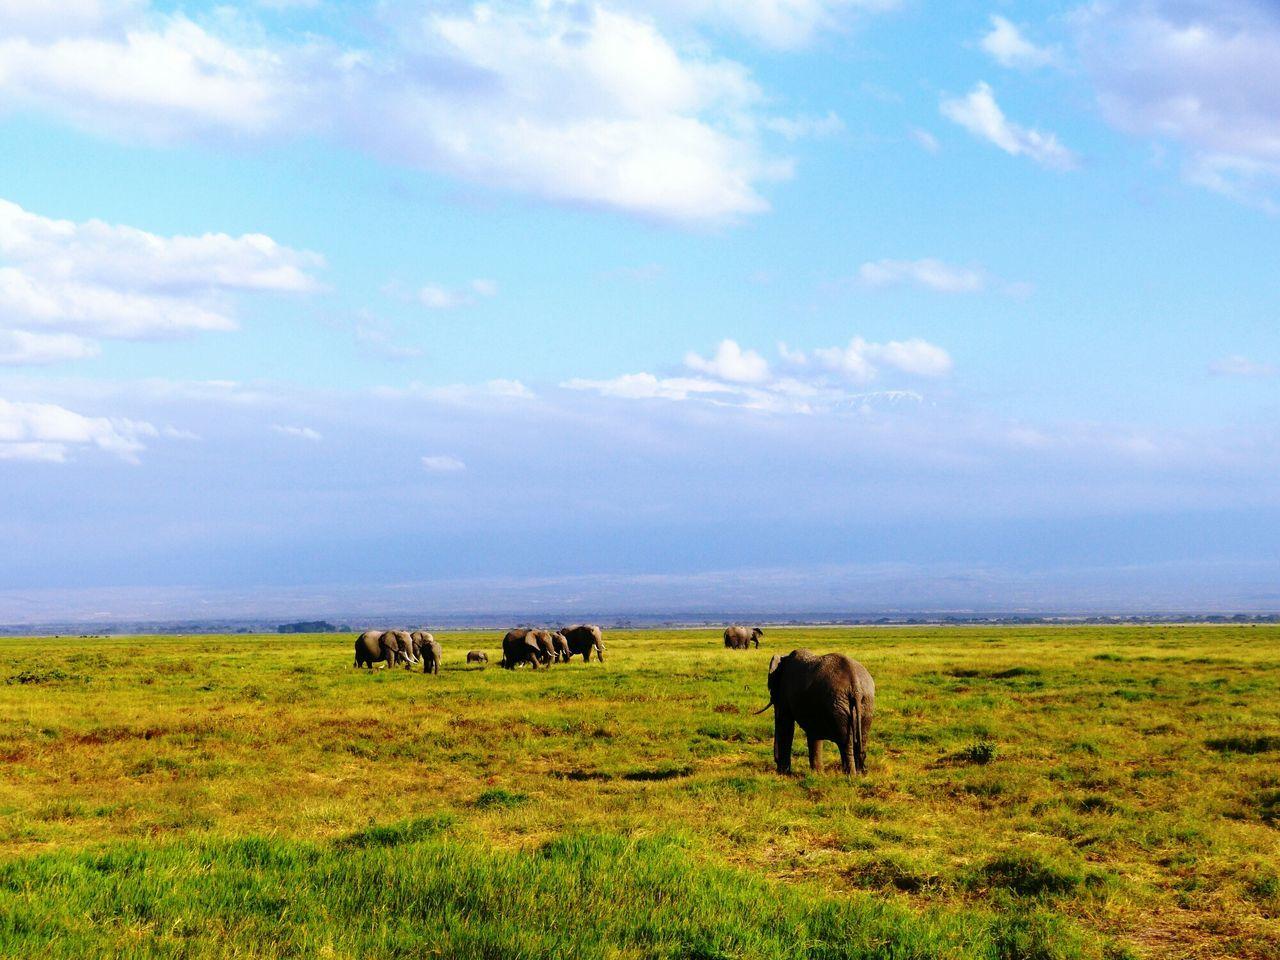 Taking Photos Kenya Animal_collection Africa Safari Share Your Adventure Nature Photography Elephants Savannah Face Of Summer